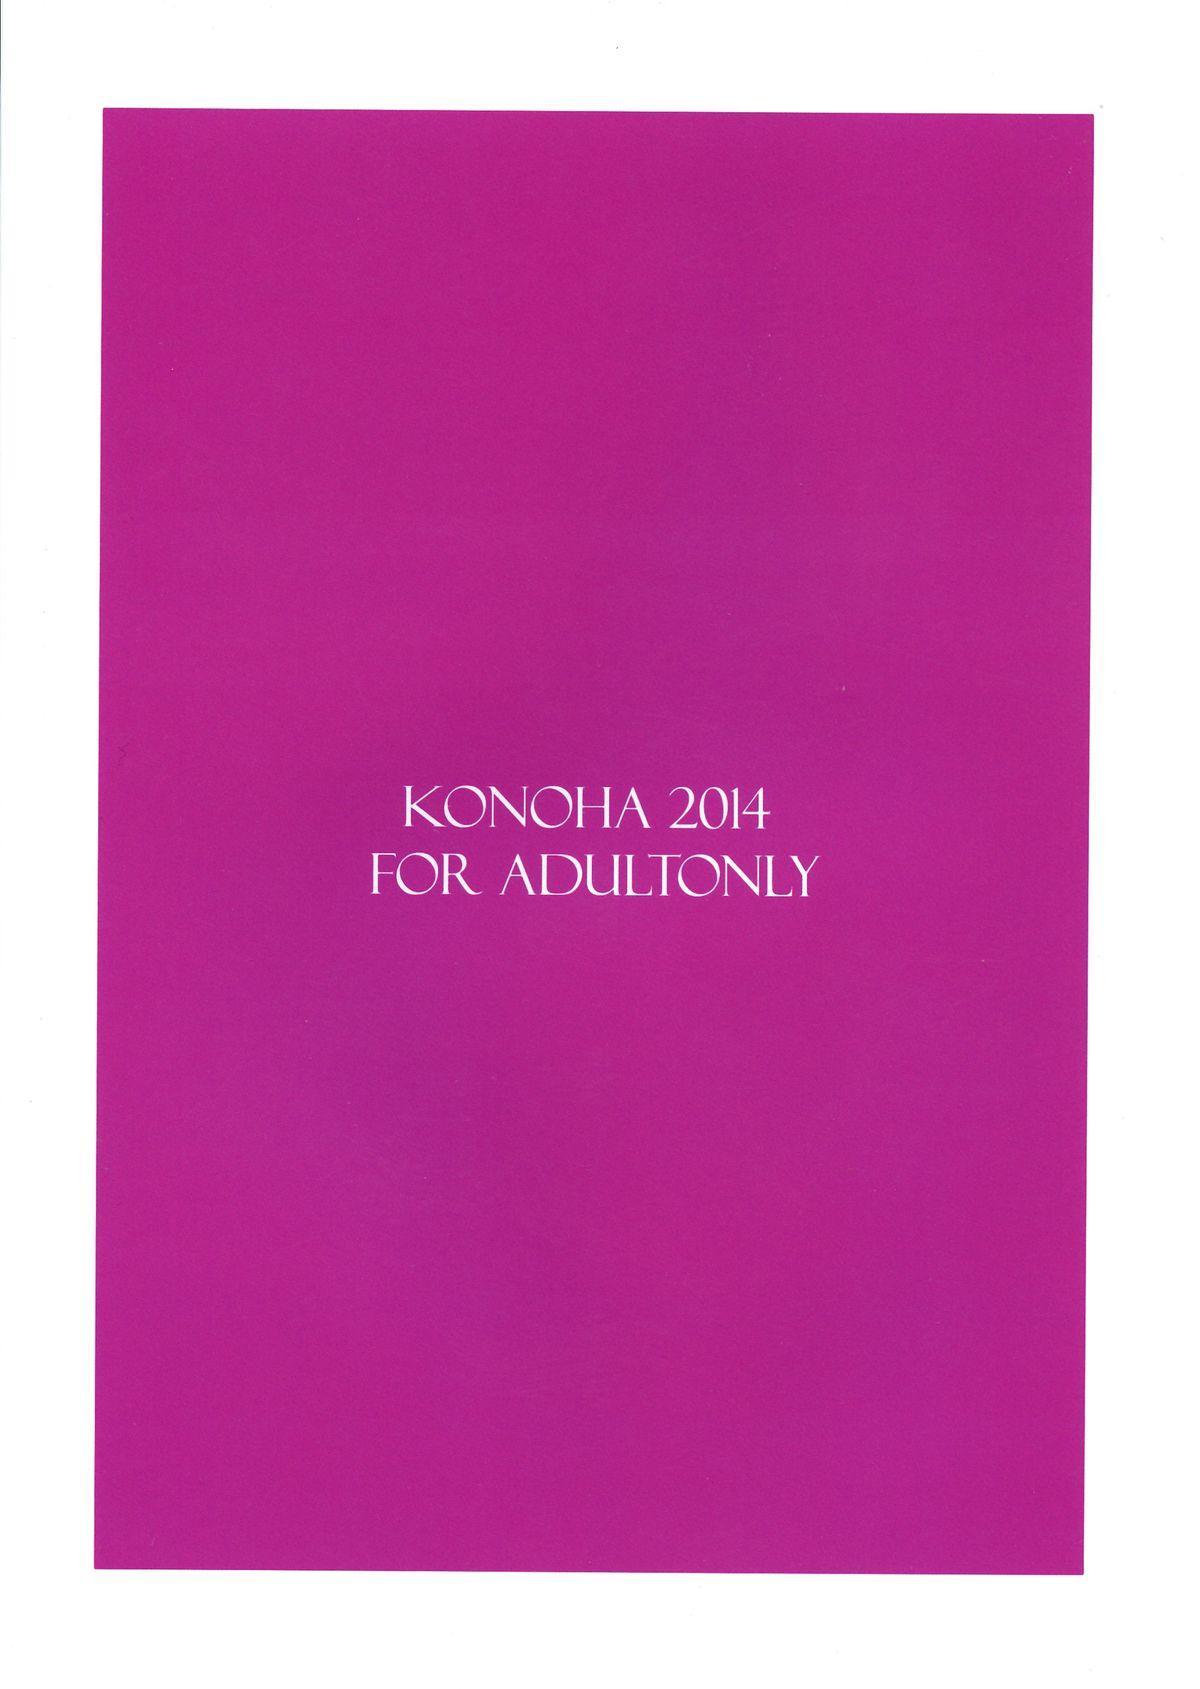 (SC65) [KONOHA (Hotei Kazuha)] Megane o Hazuseba [Nyaa] to naku (THE IDOLM@STER CINDERELLA GIRLS) 1